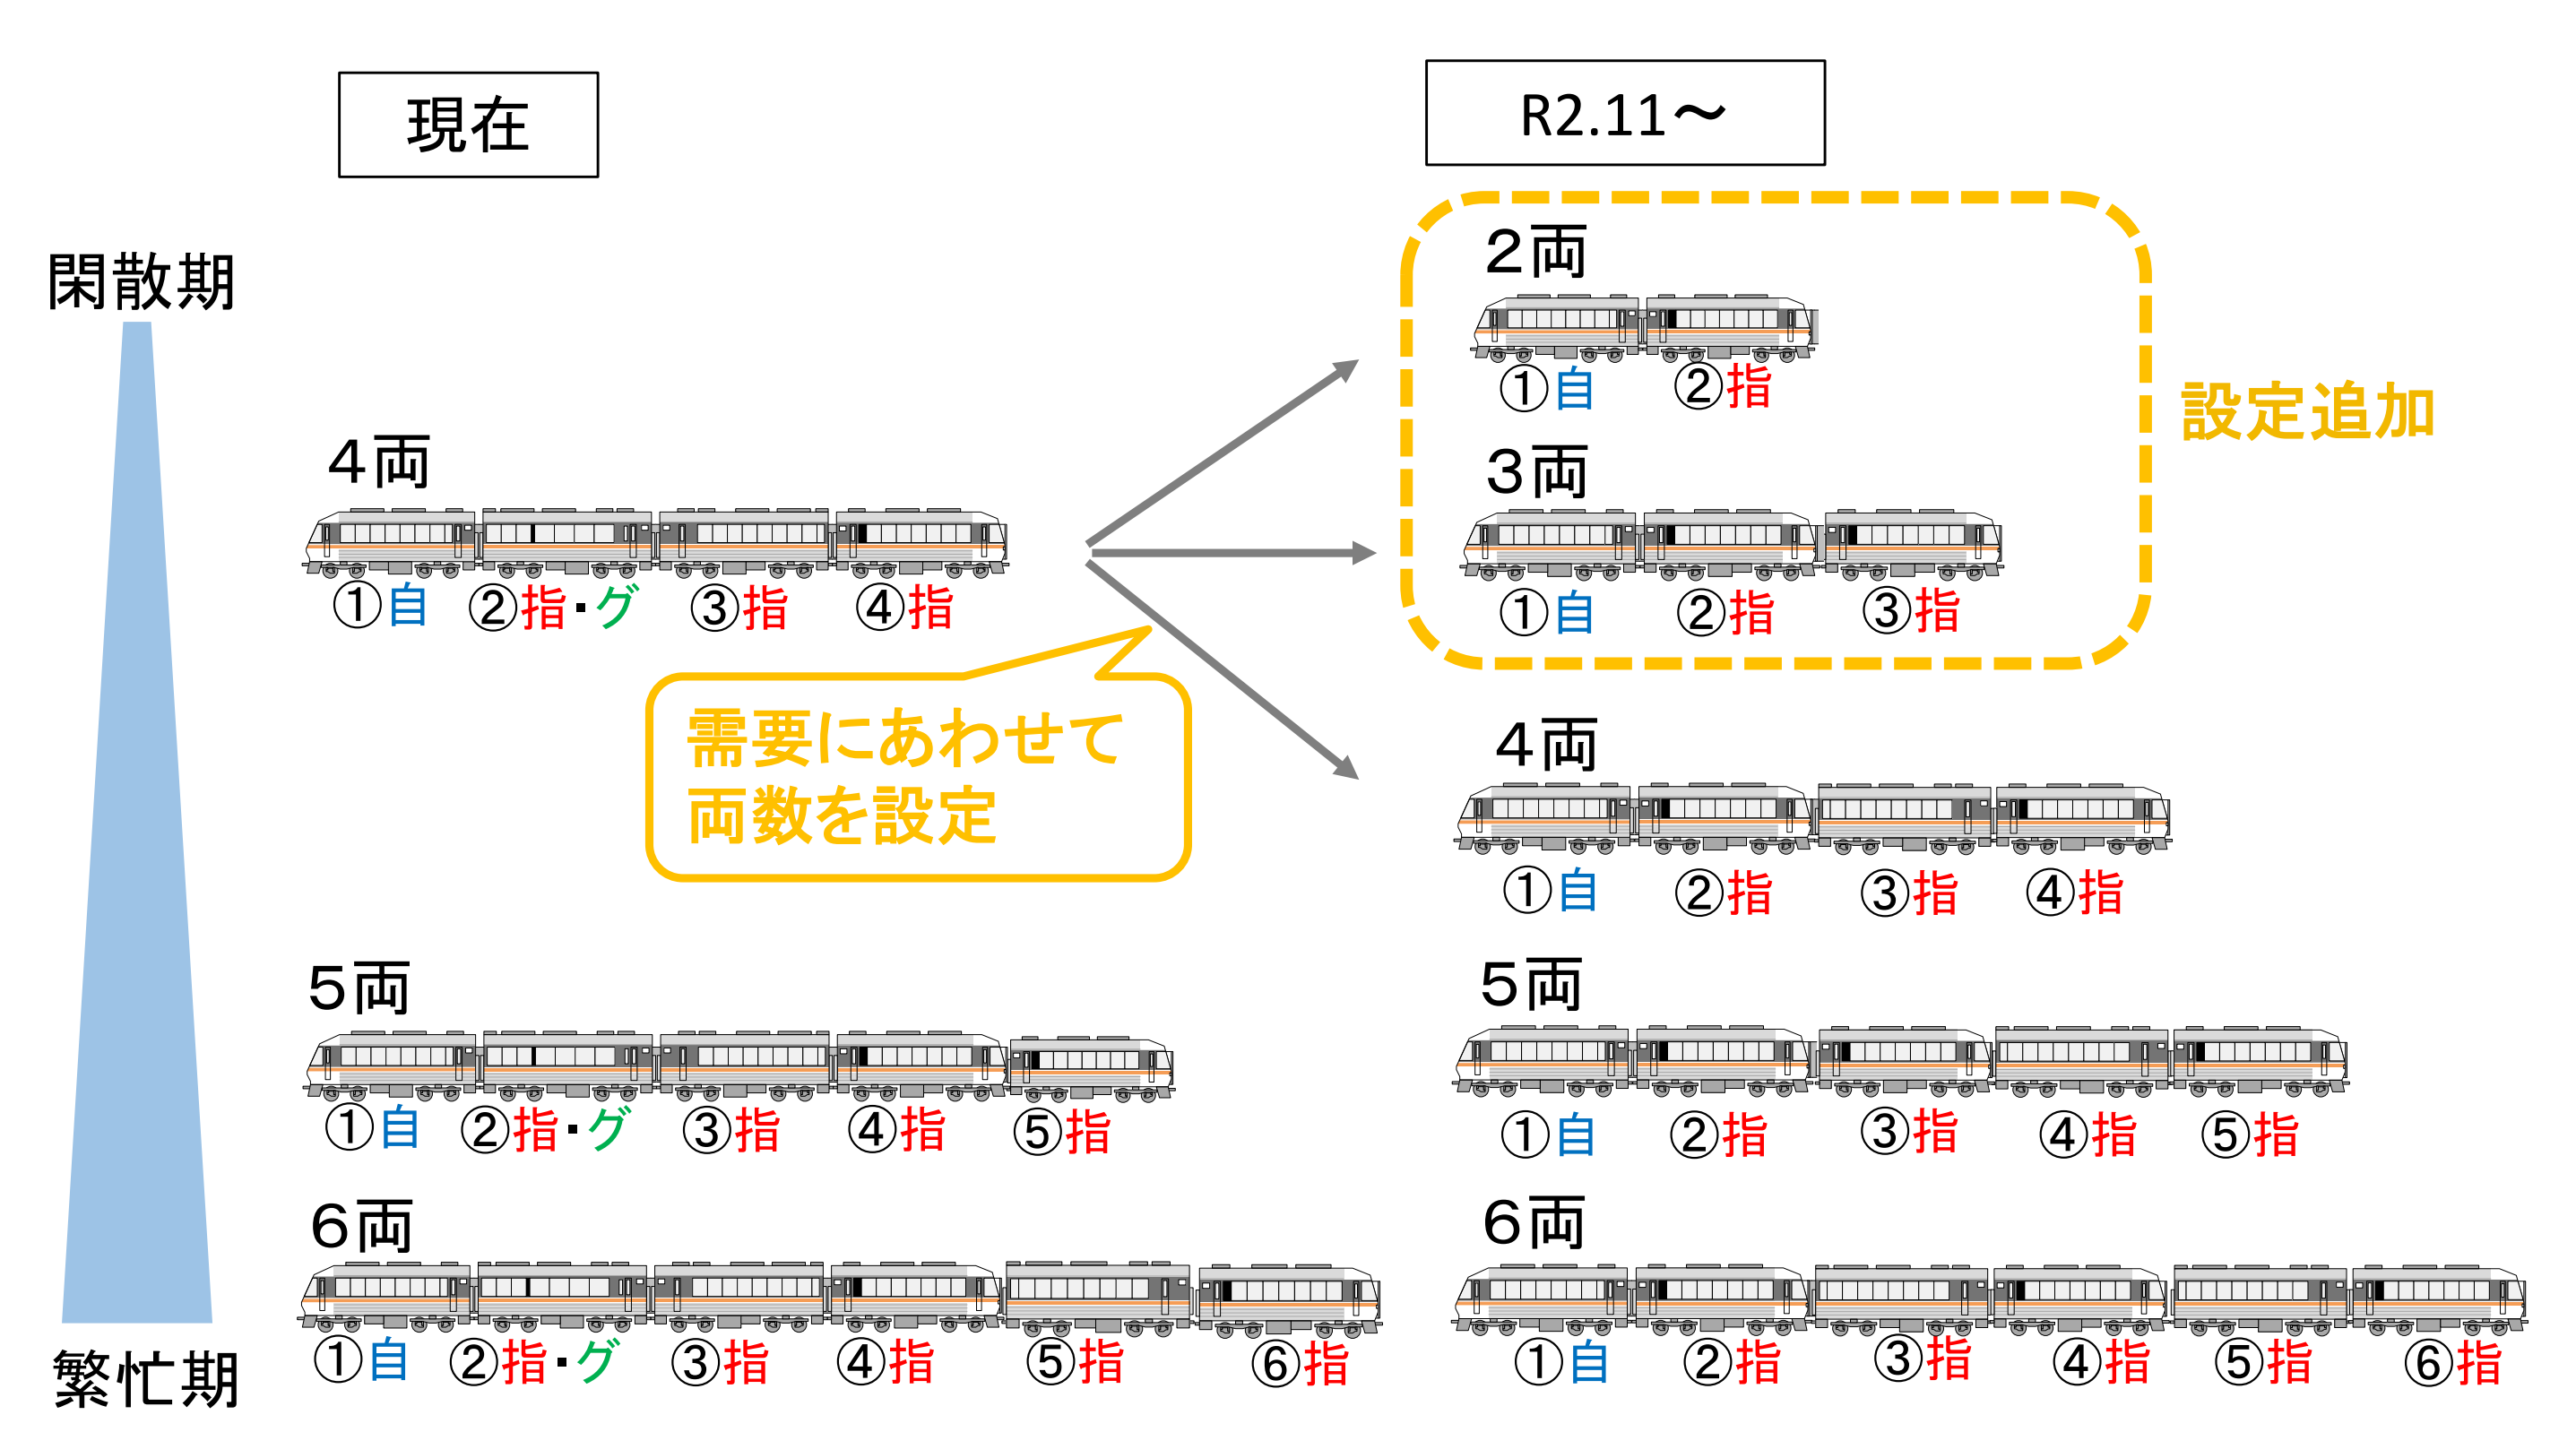 【JR東海】2両のグリーン車なし「ワイドビュー南紀」を11月から運転 需要減が影響